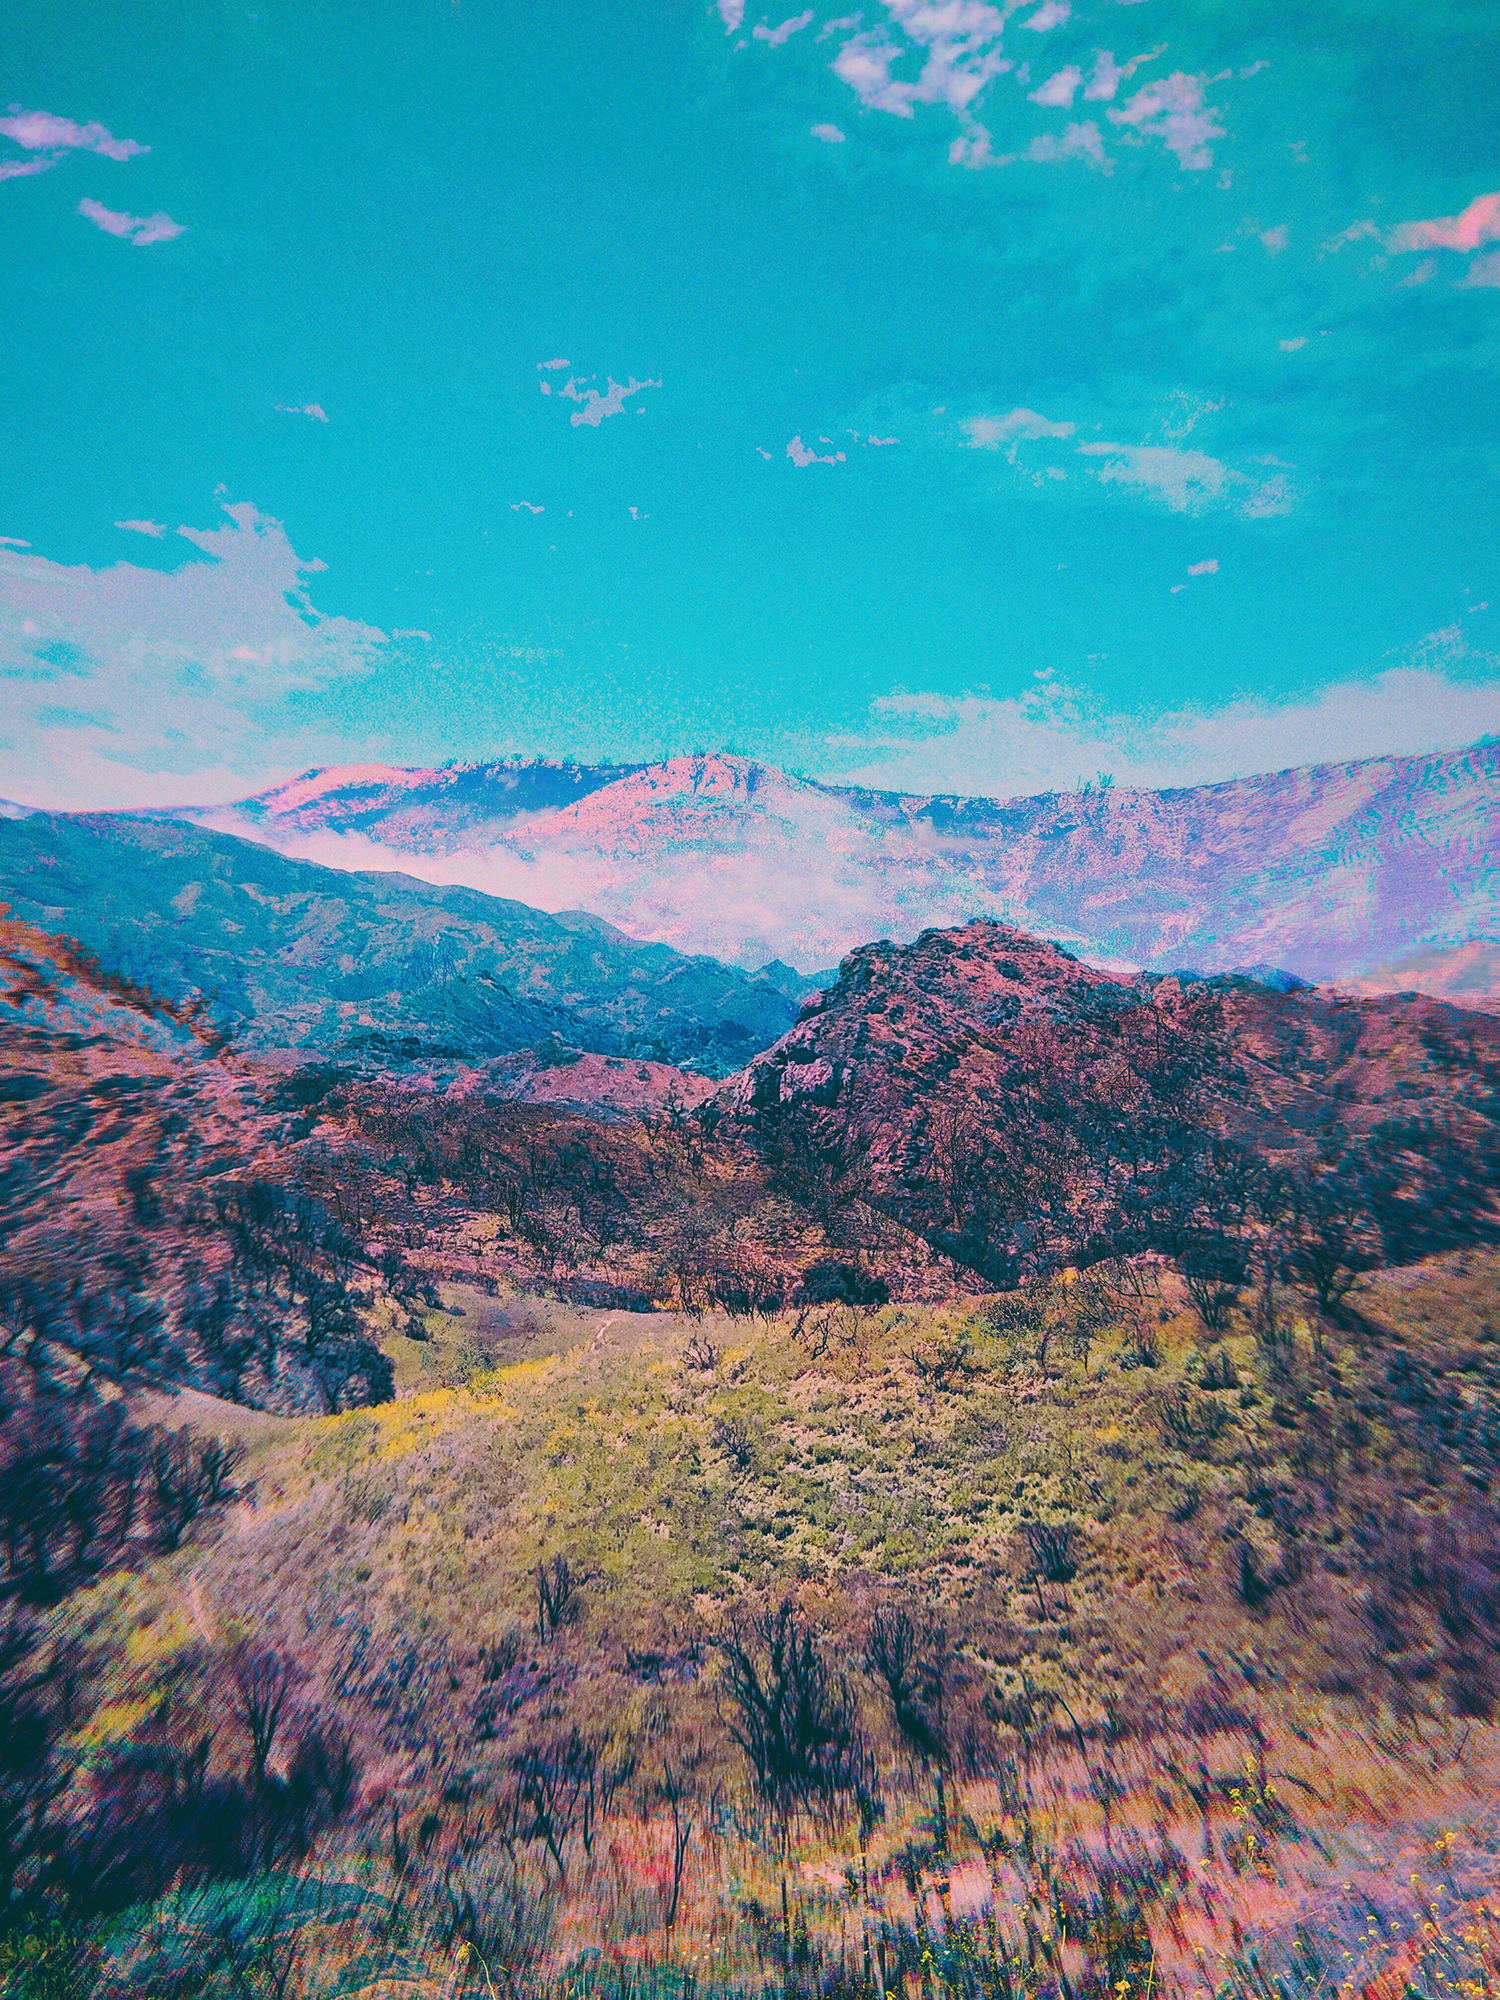 Sea Of Hills